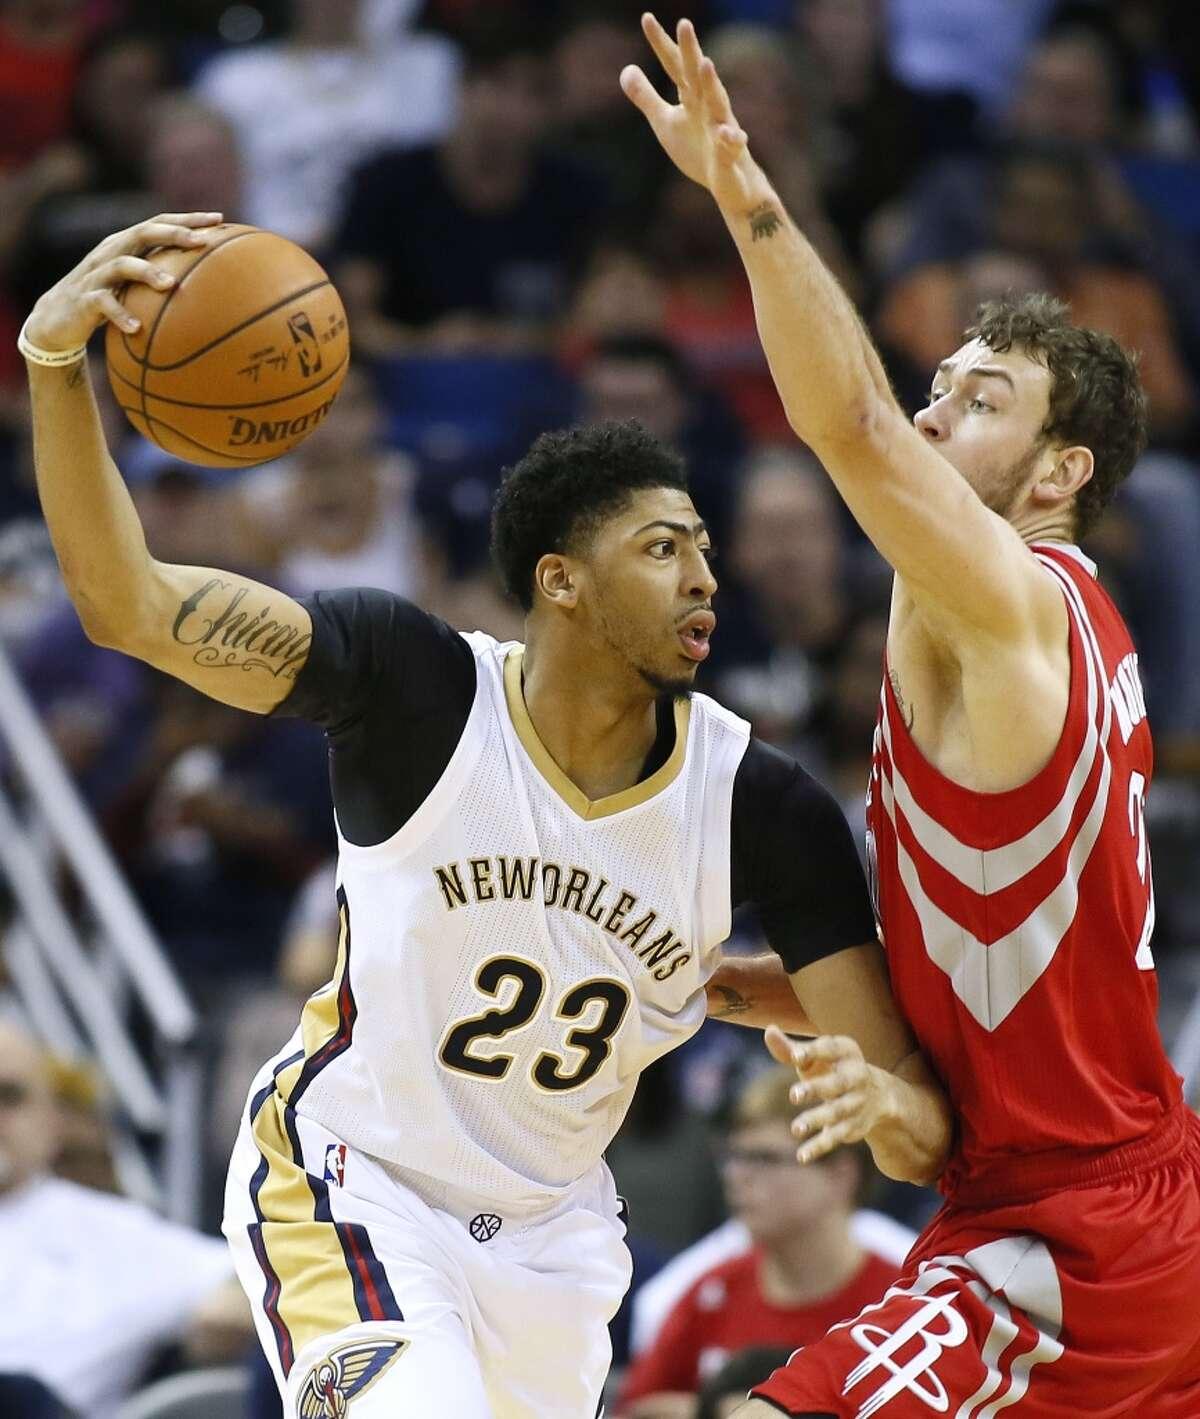 13. Anthony Davis, New Orleans Pelicans